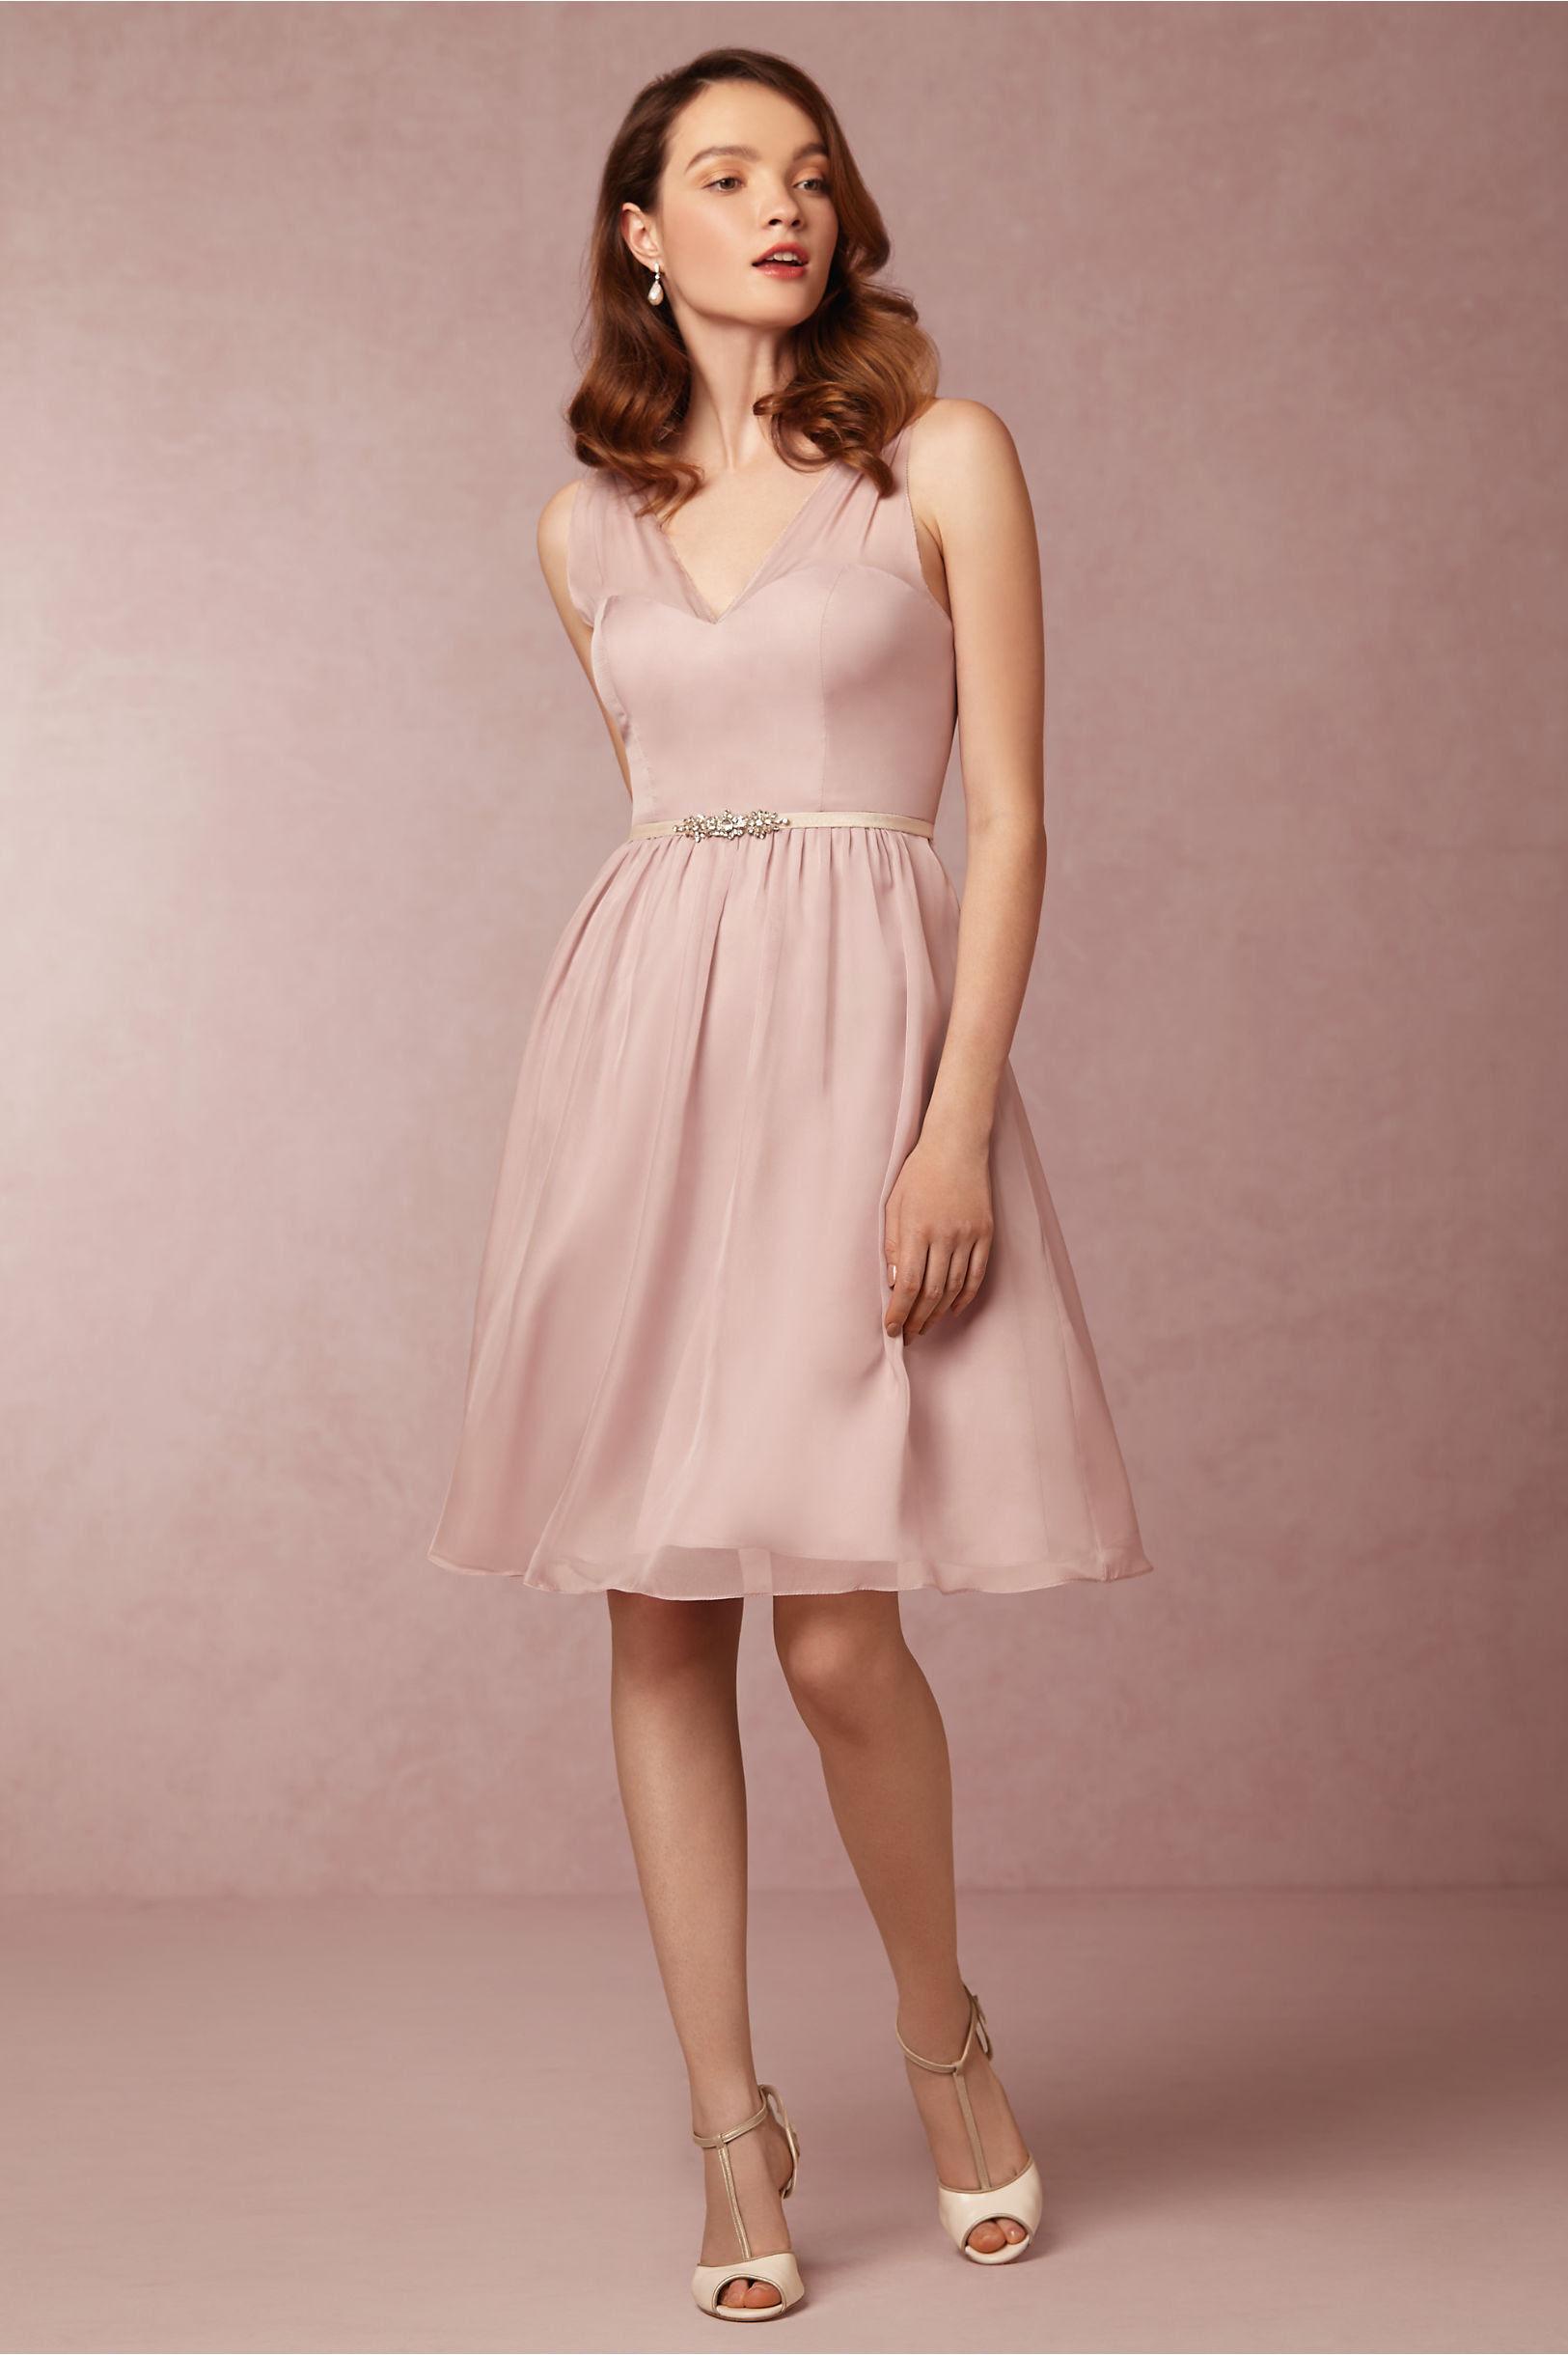 Sleeveless Dusty Pink  Chiffon Knee Length Bridesmaid Dress with Crystal Ribon _1